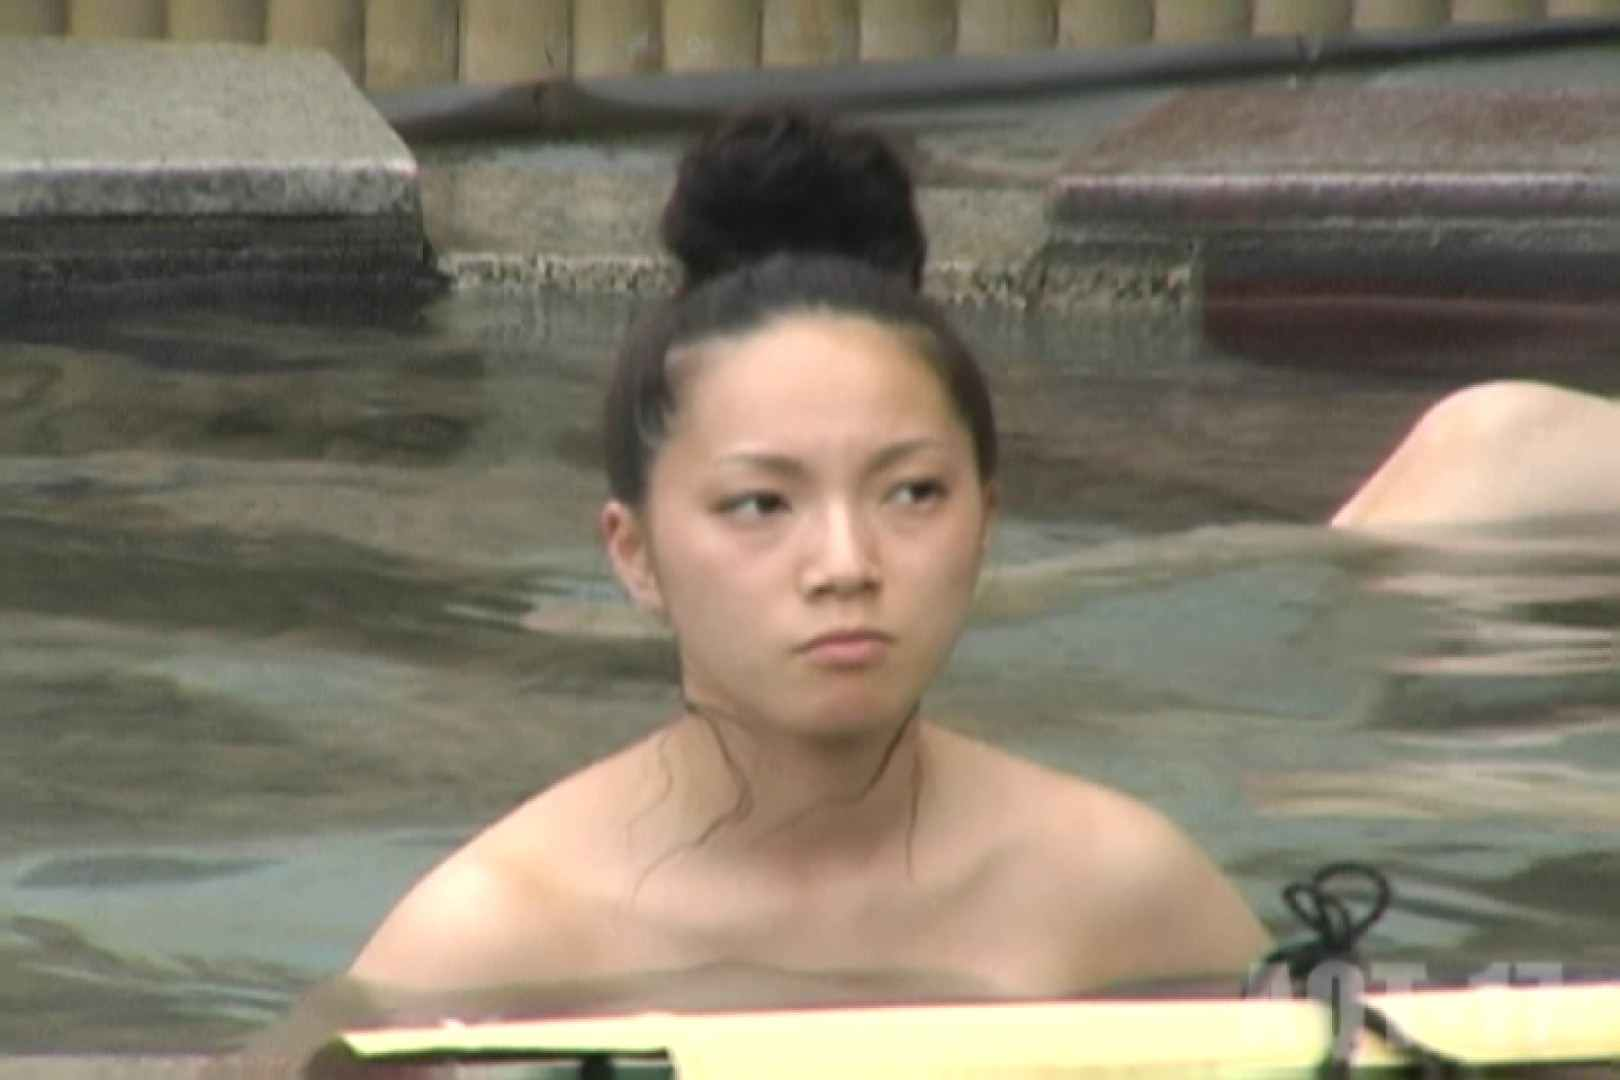 Aquaな露天風呂Vol.853 露天風呂突入 | 美しいOLの裸体  80pic 1